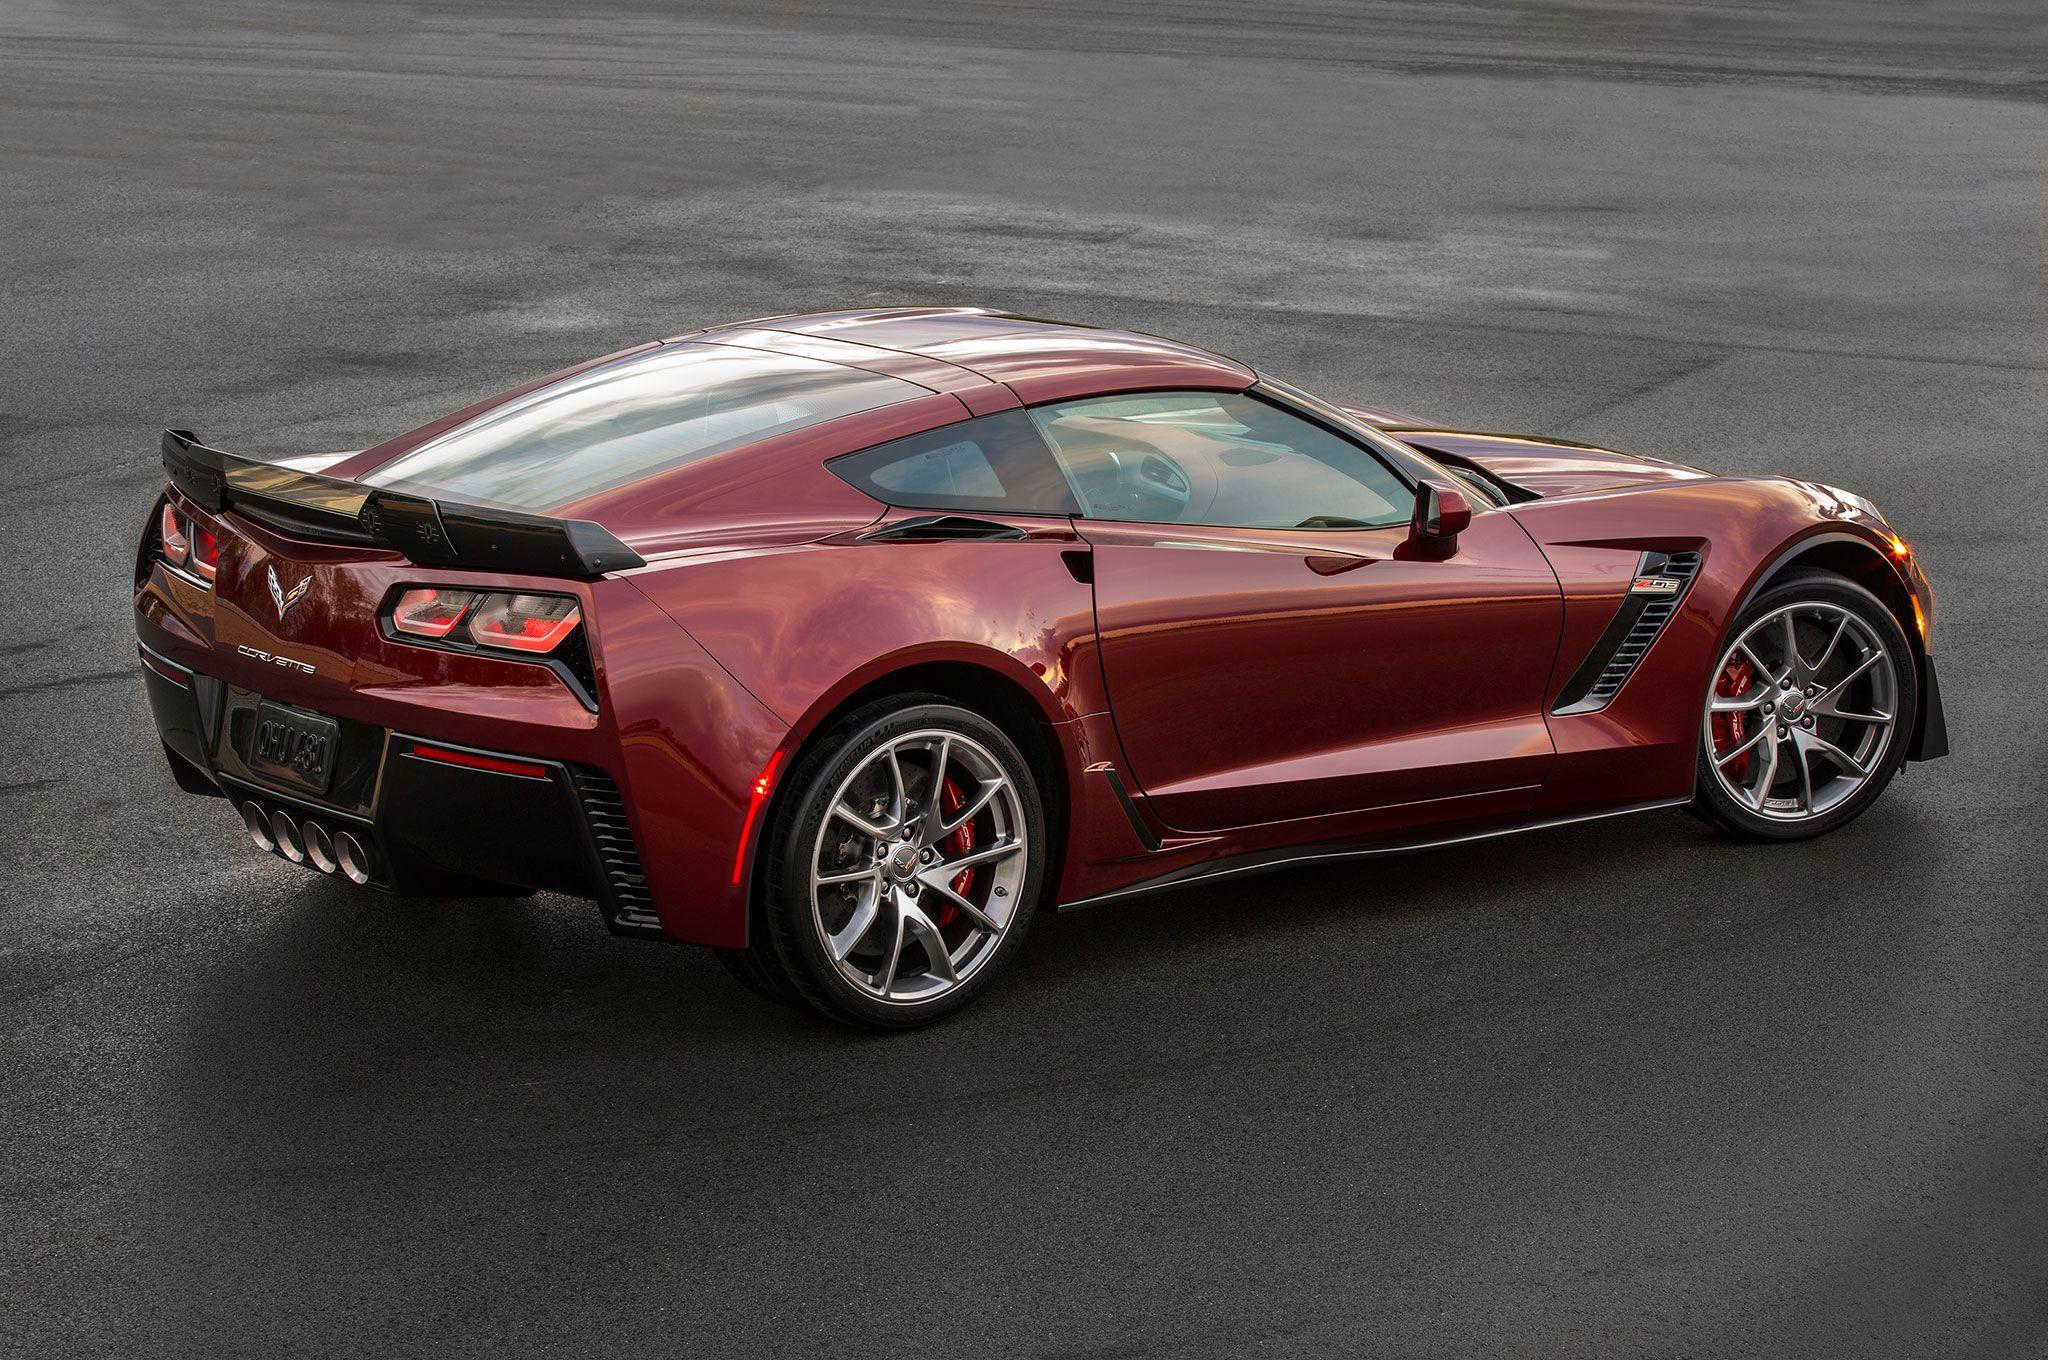 2016 Chevrolet Corvette Z06 Spice Red Design package rear three